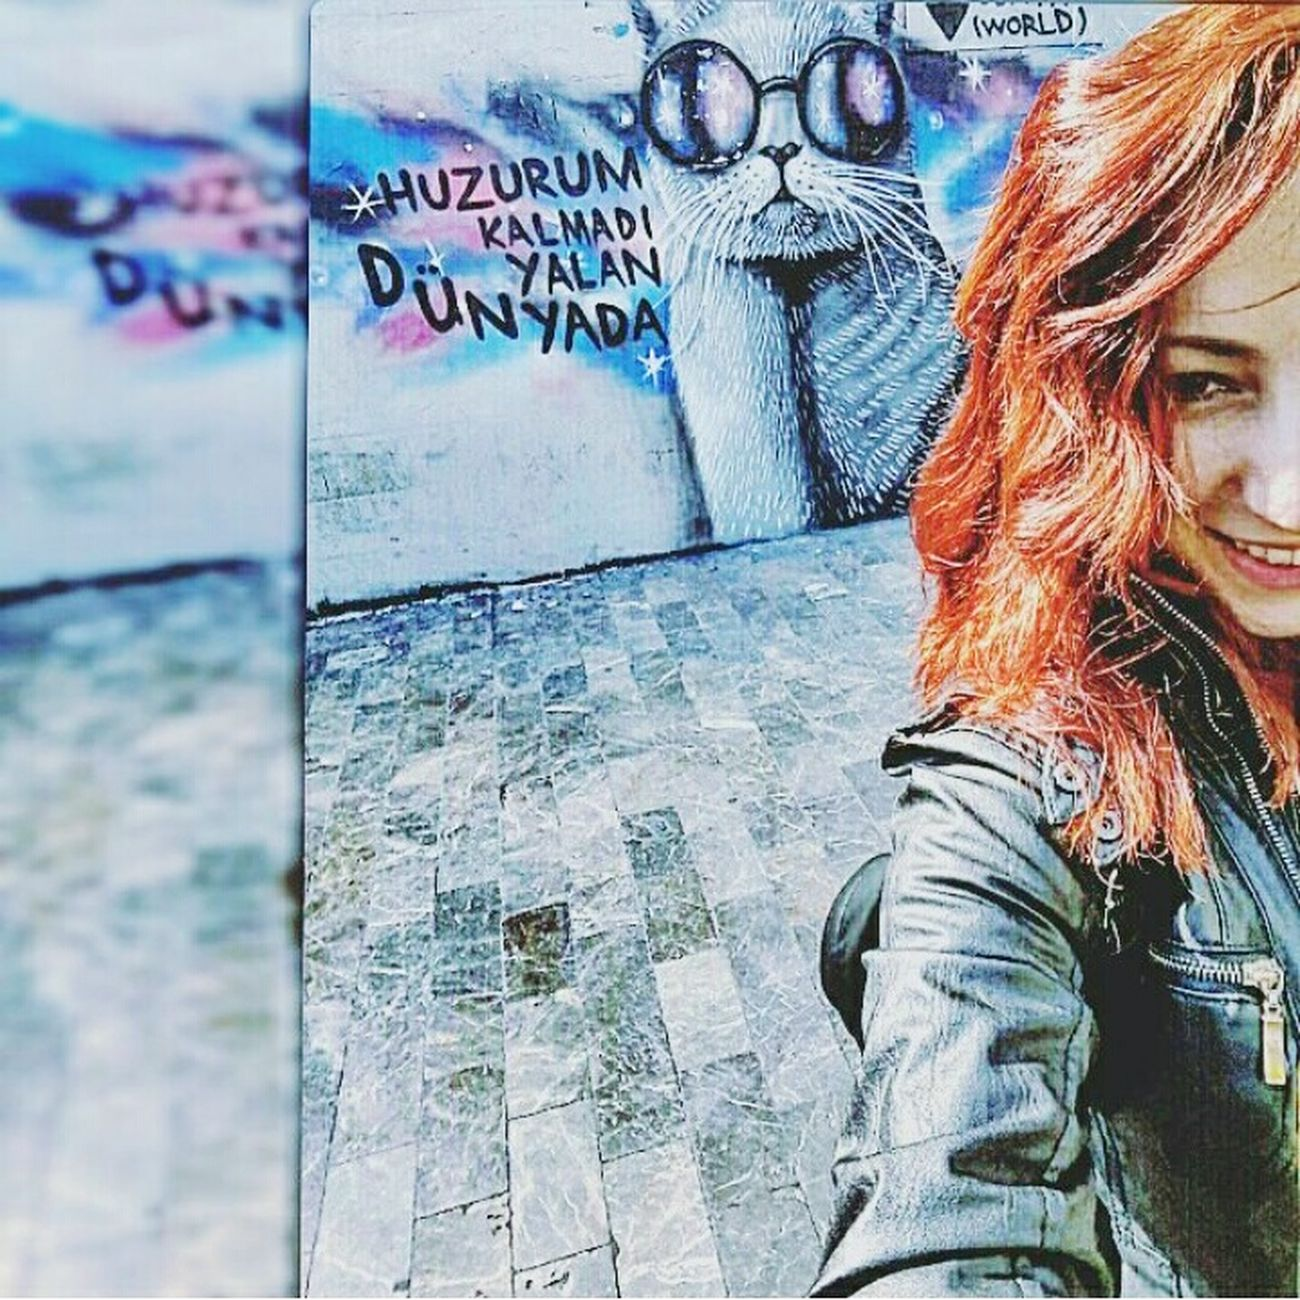 Graffiti Sokaktahayatvar Sokakkedisi Sokakfotografi Streetphotography Duvaryazıları  Istanbuldayasam Istanbullovers Istanbul City Self Portrait Smile ✌ Beauty Pretty EyeEm Picoftheday Myself Beautiful Pic EyeEm Gallery